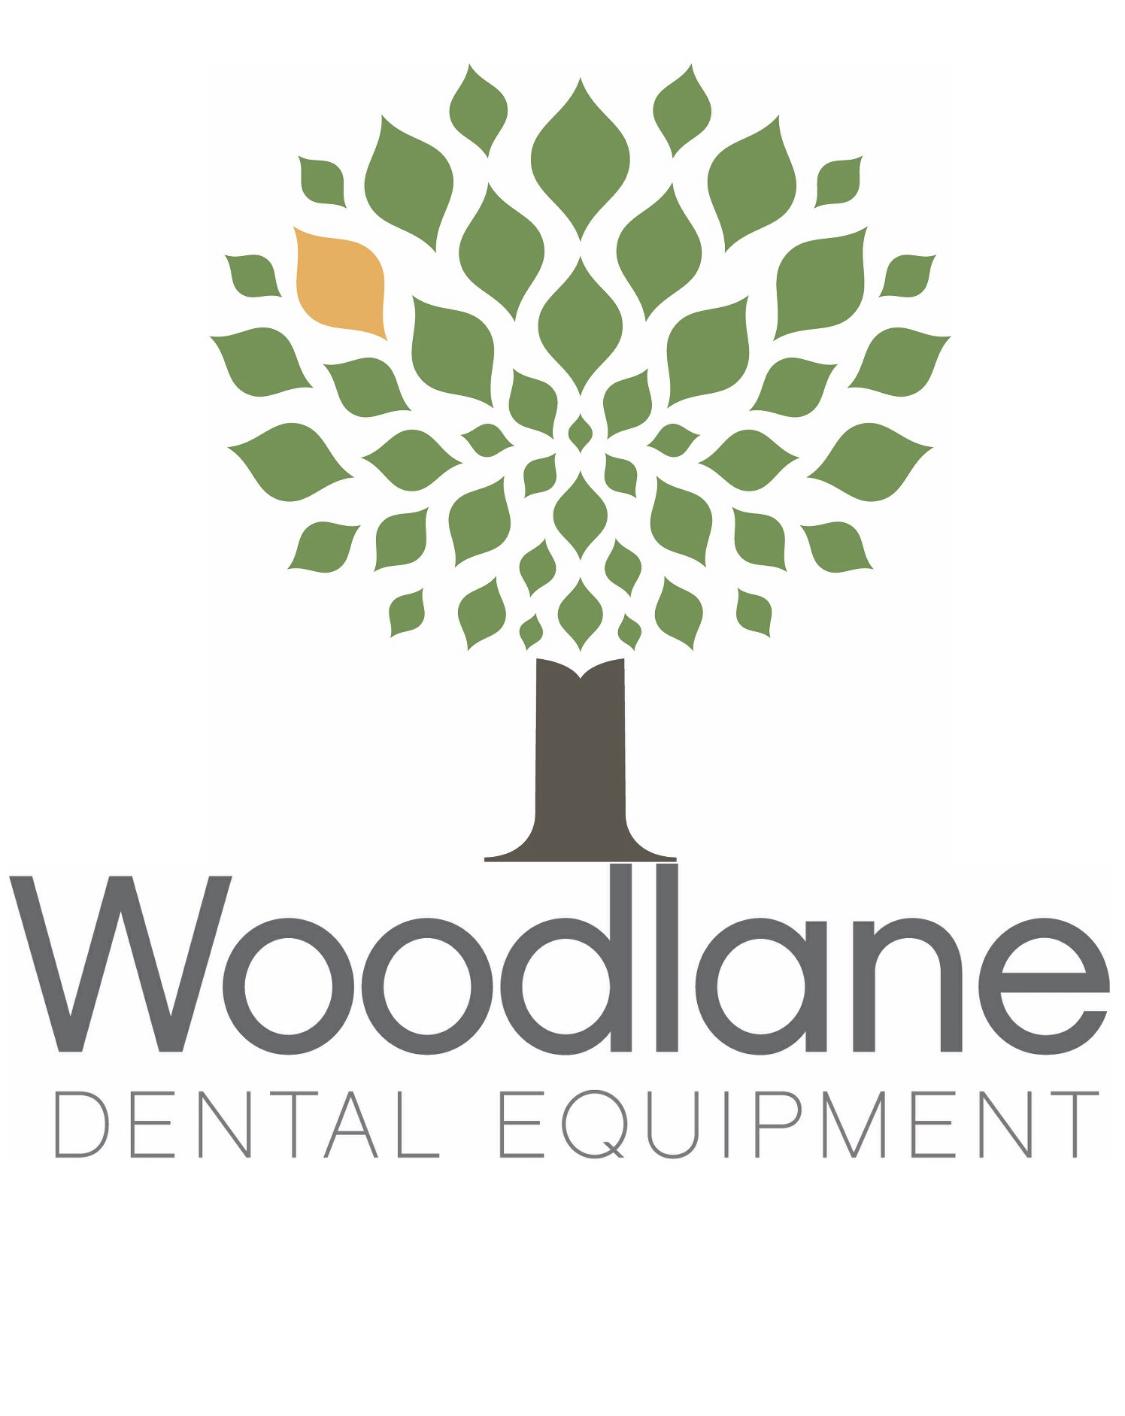 Woodlane Dental Equipment Logo